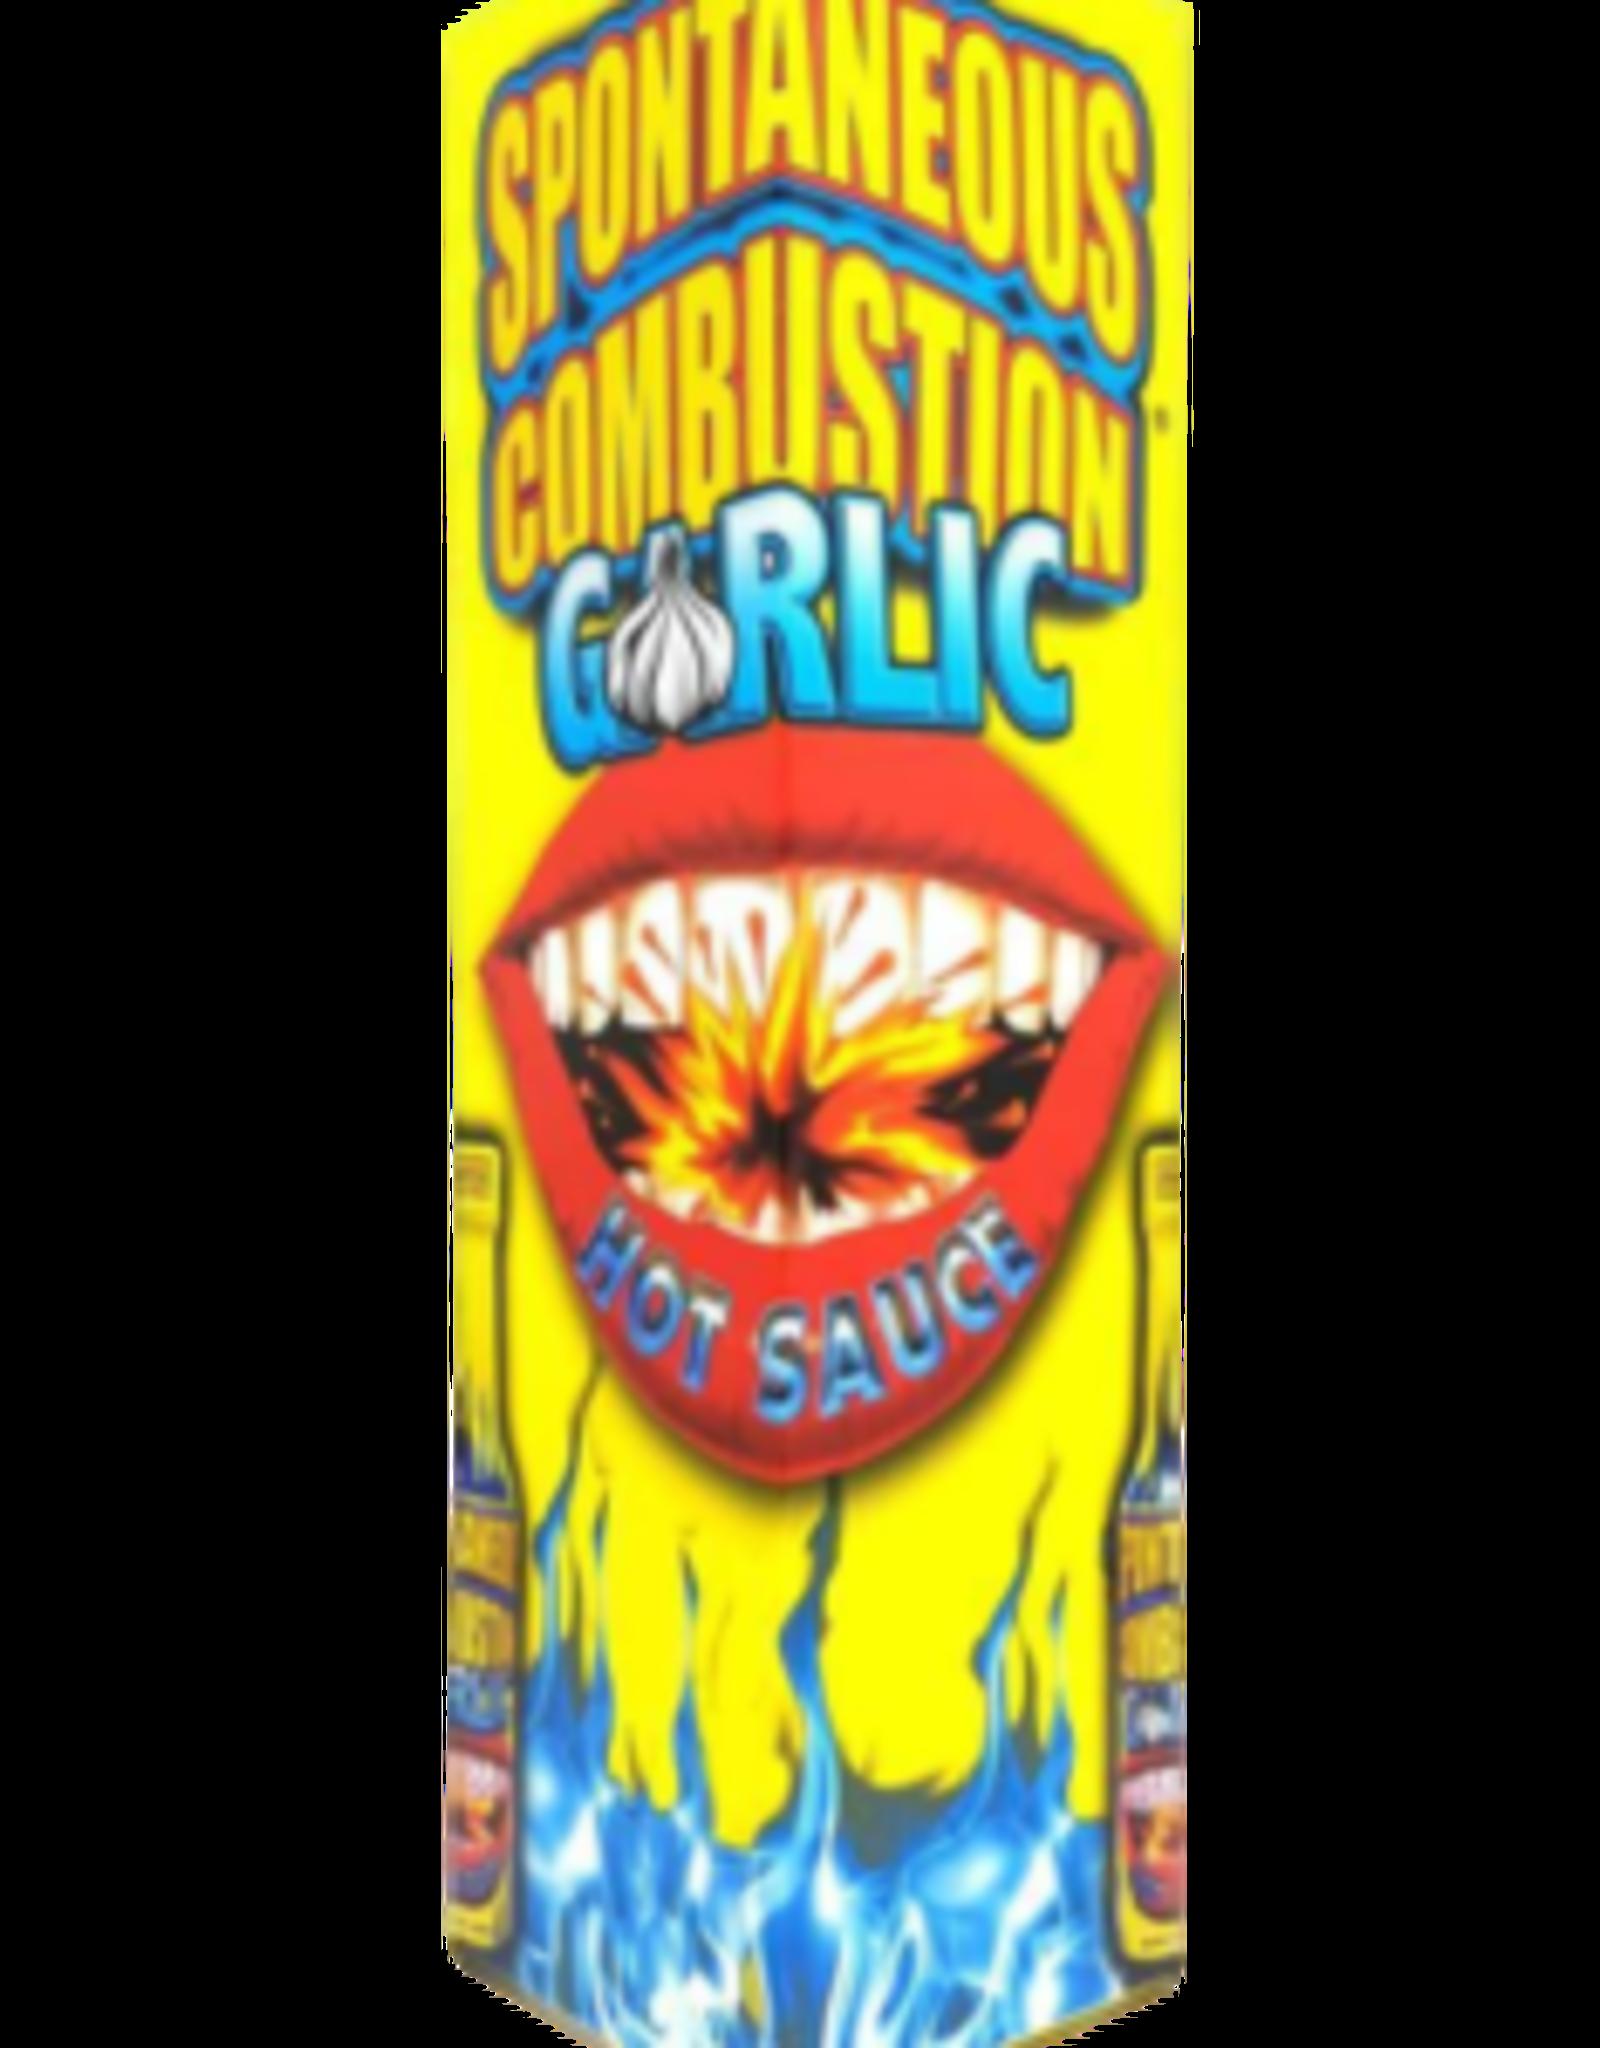 Spontaneous Combustion Garlic